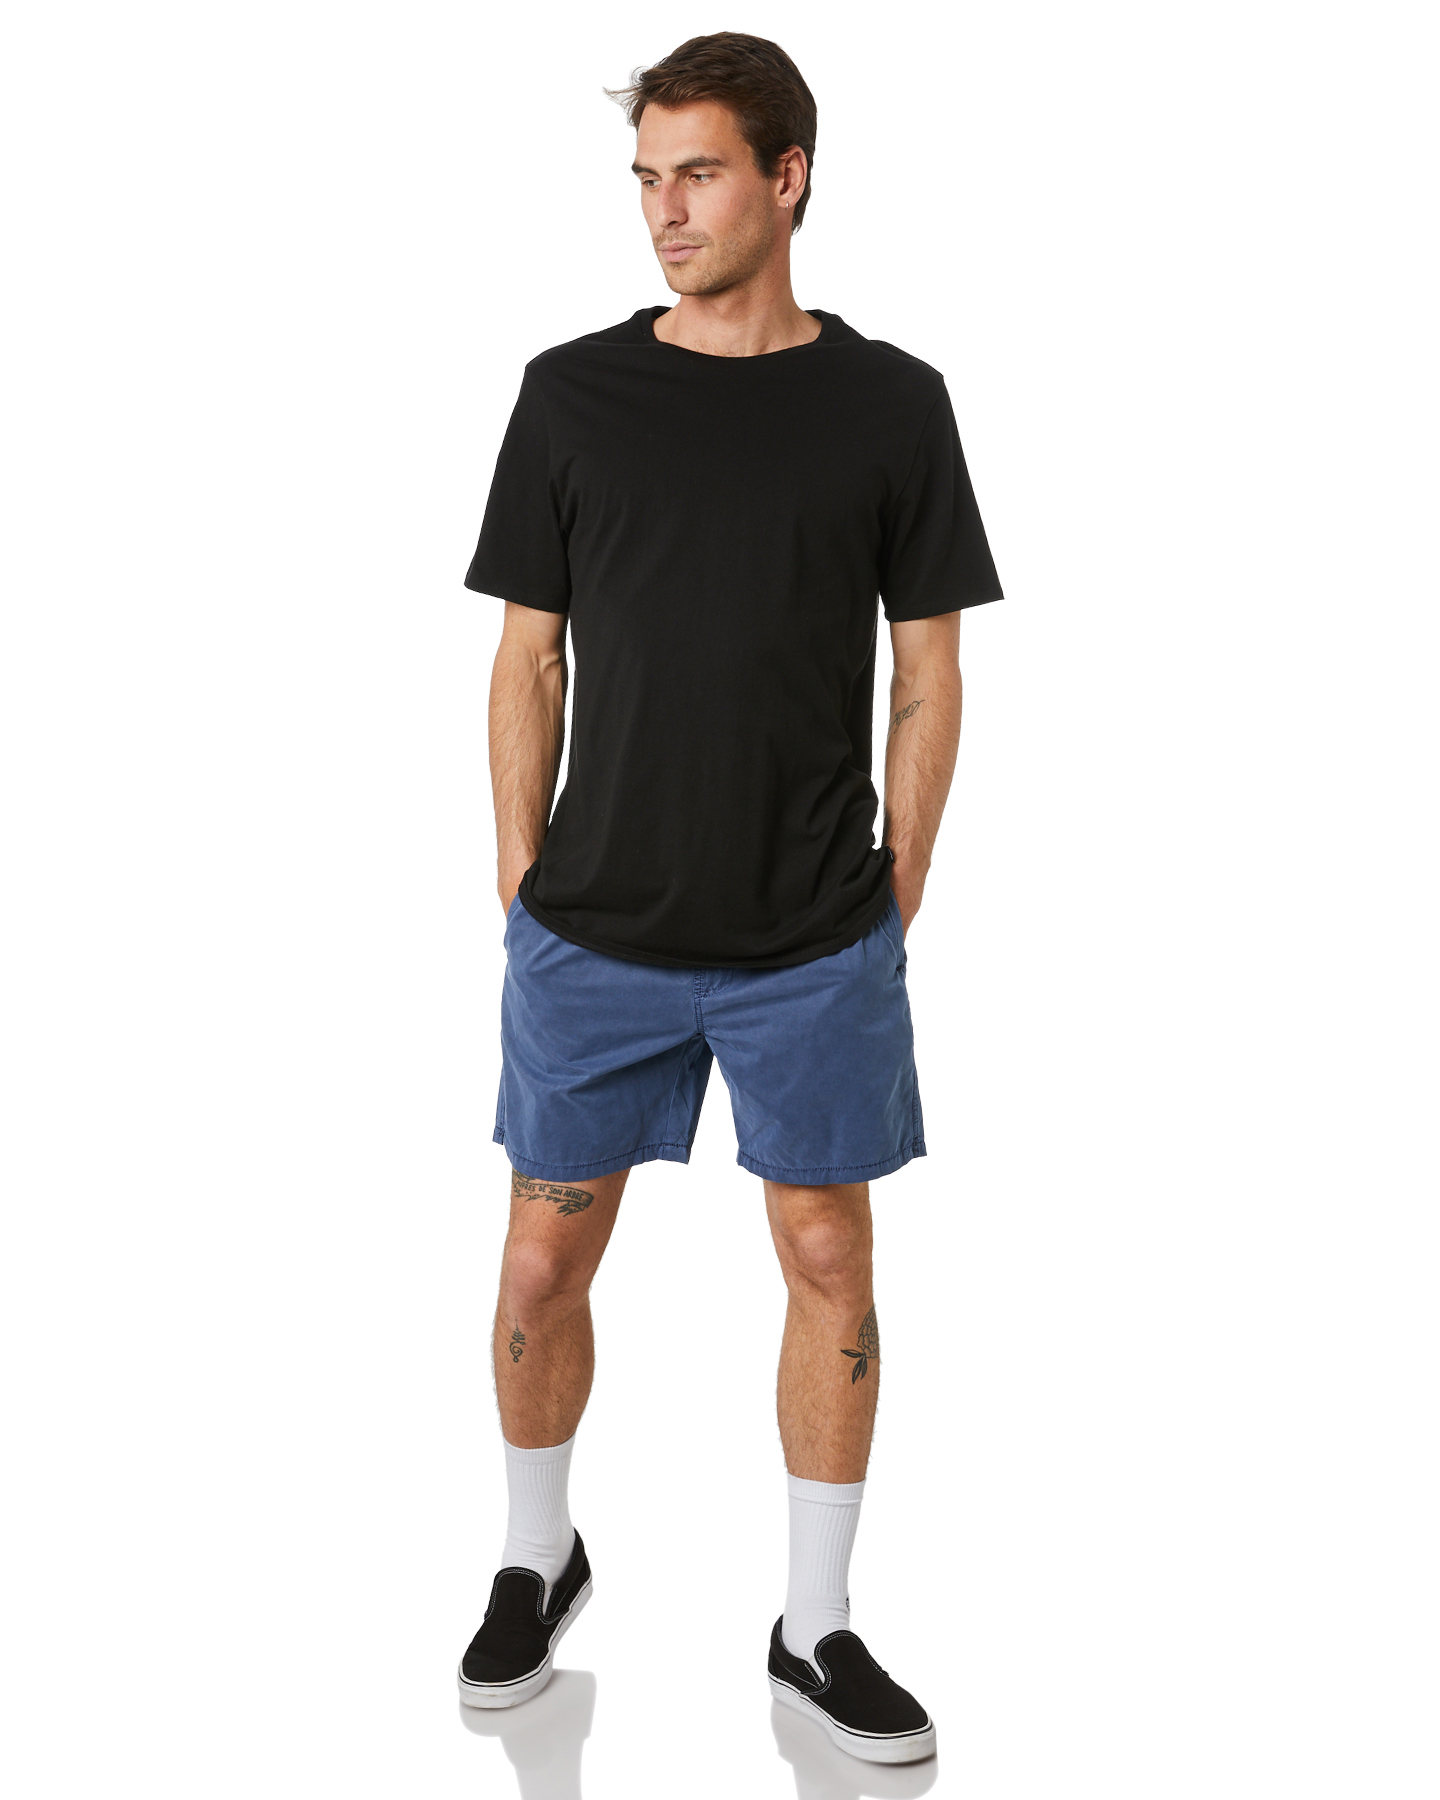 New-Swell-Men-039-s-Malibu-Mens-Beach-Short-Cotton-Polyester-Grey thumbnail 28